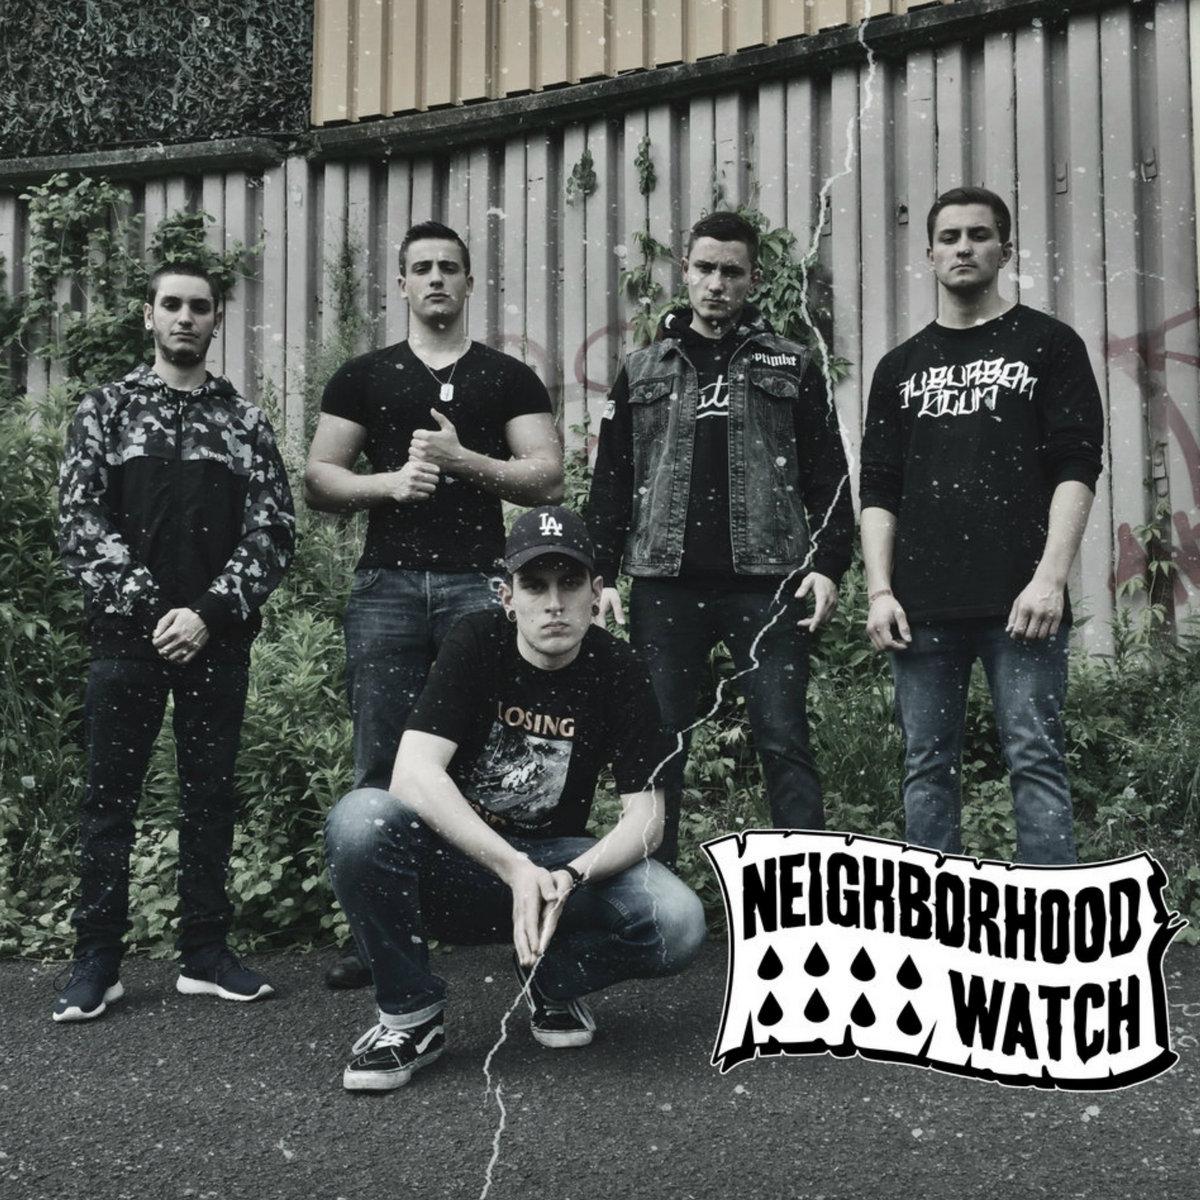 Neighbourhood Watch   Neighbourhood Watch in Wycombe District